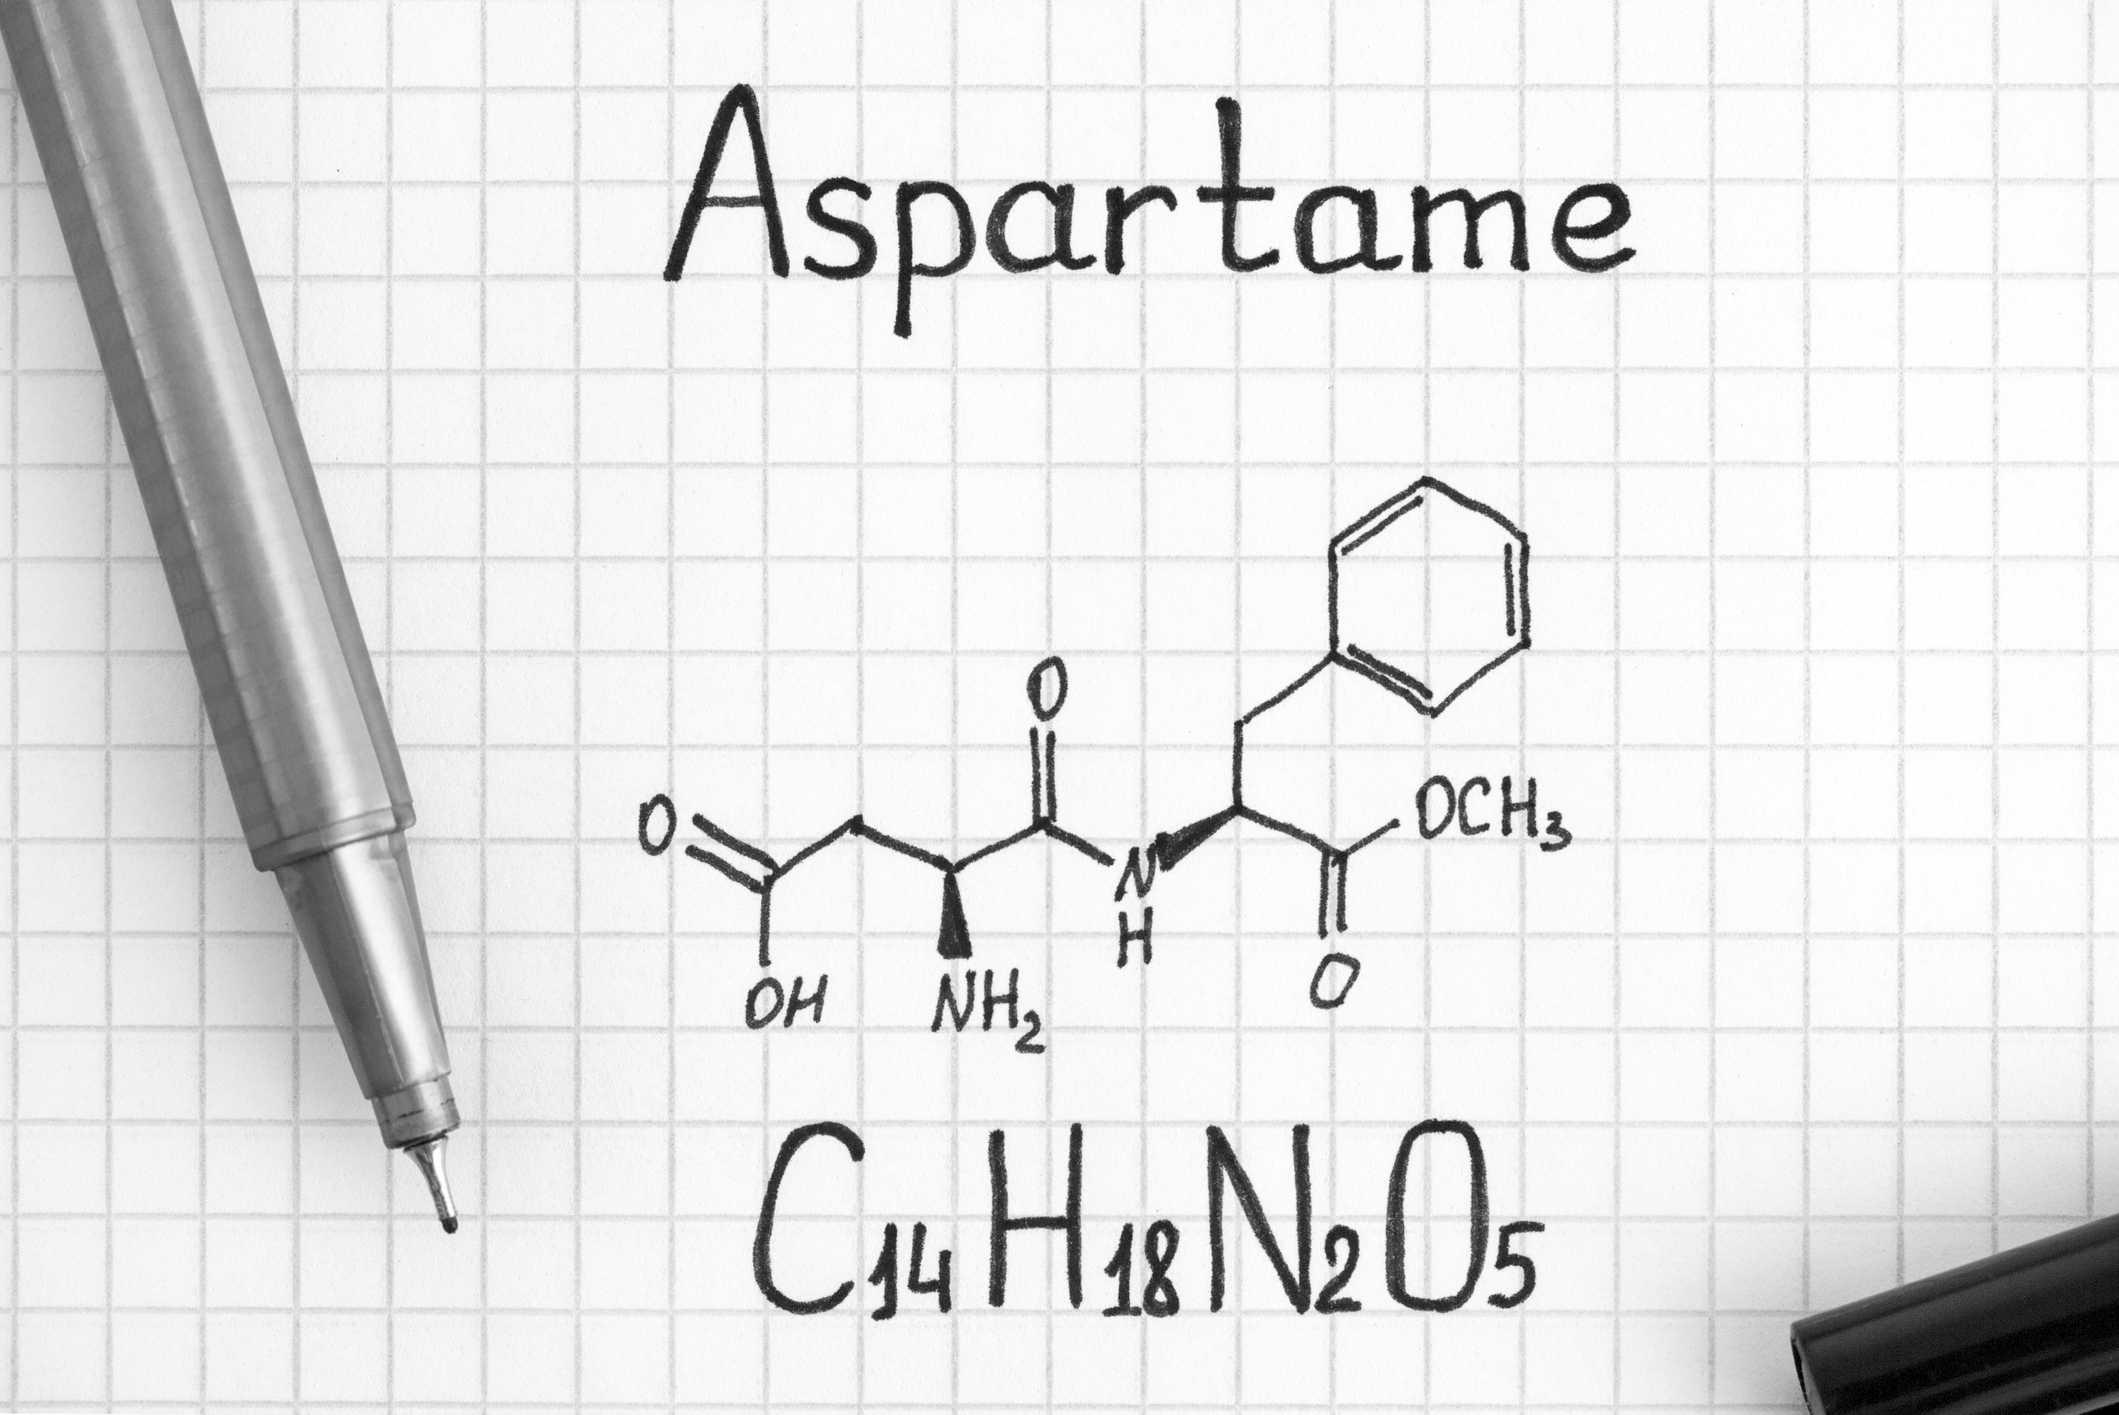 aspartame diabetes 2020 gmc